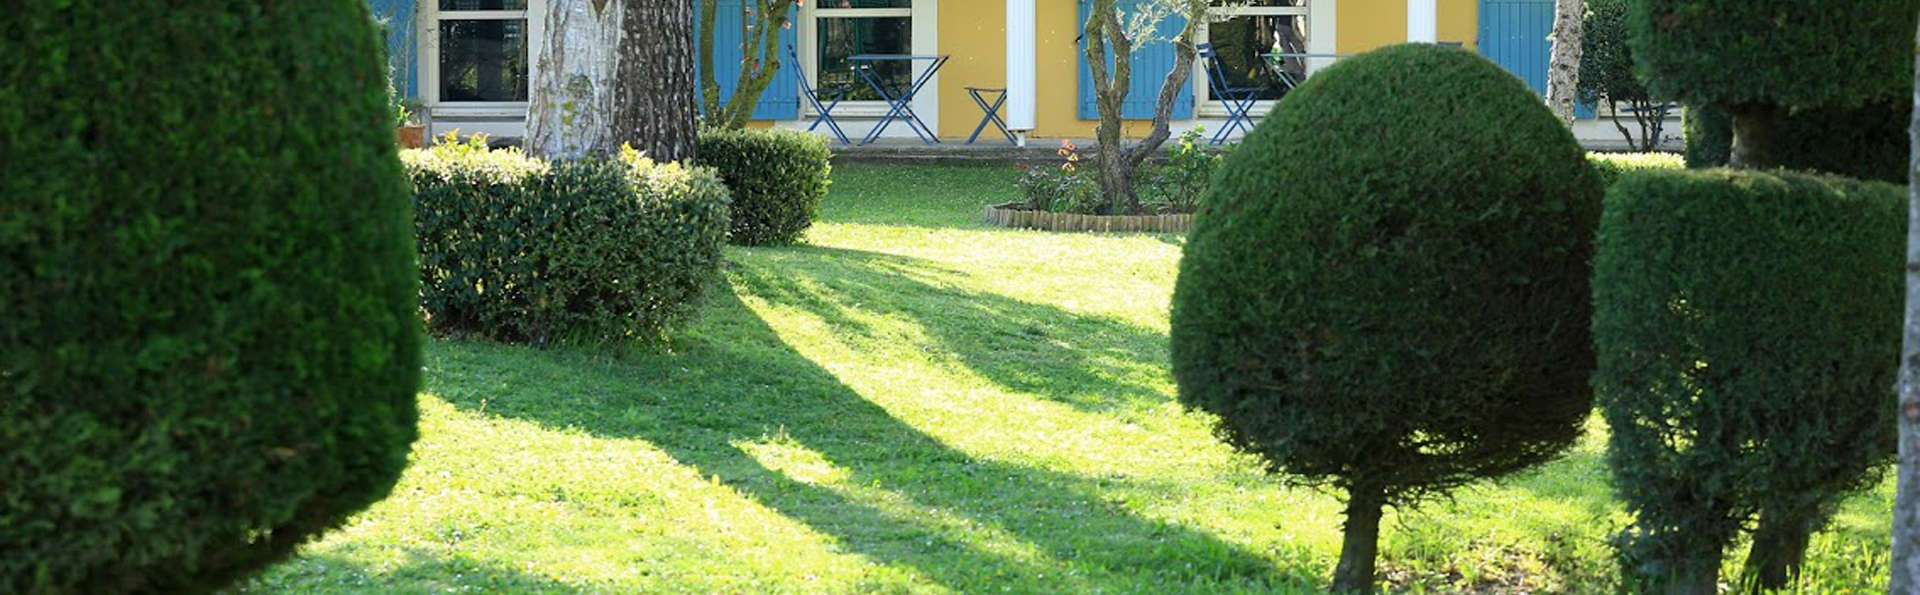 Le Domaine de la Petite Isle - Luberon - edit_garden5.jpg